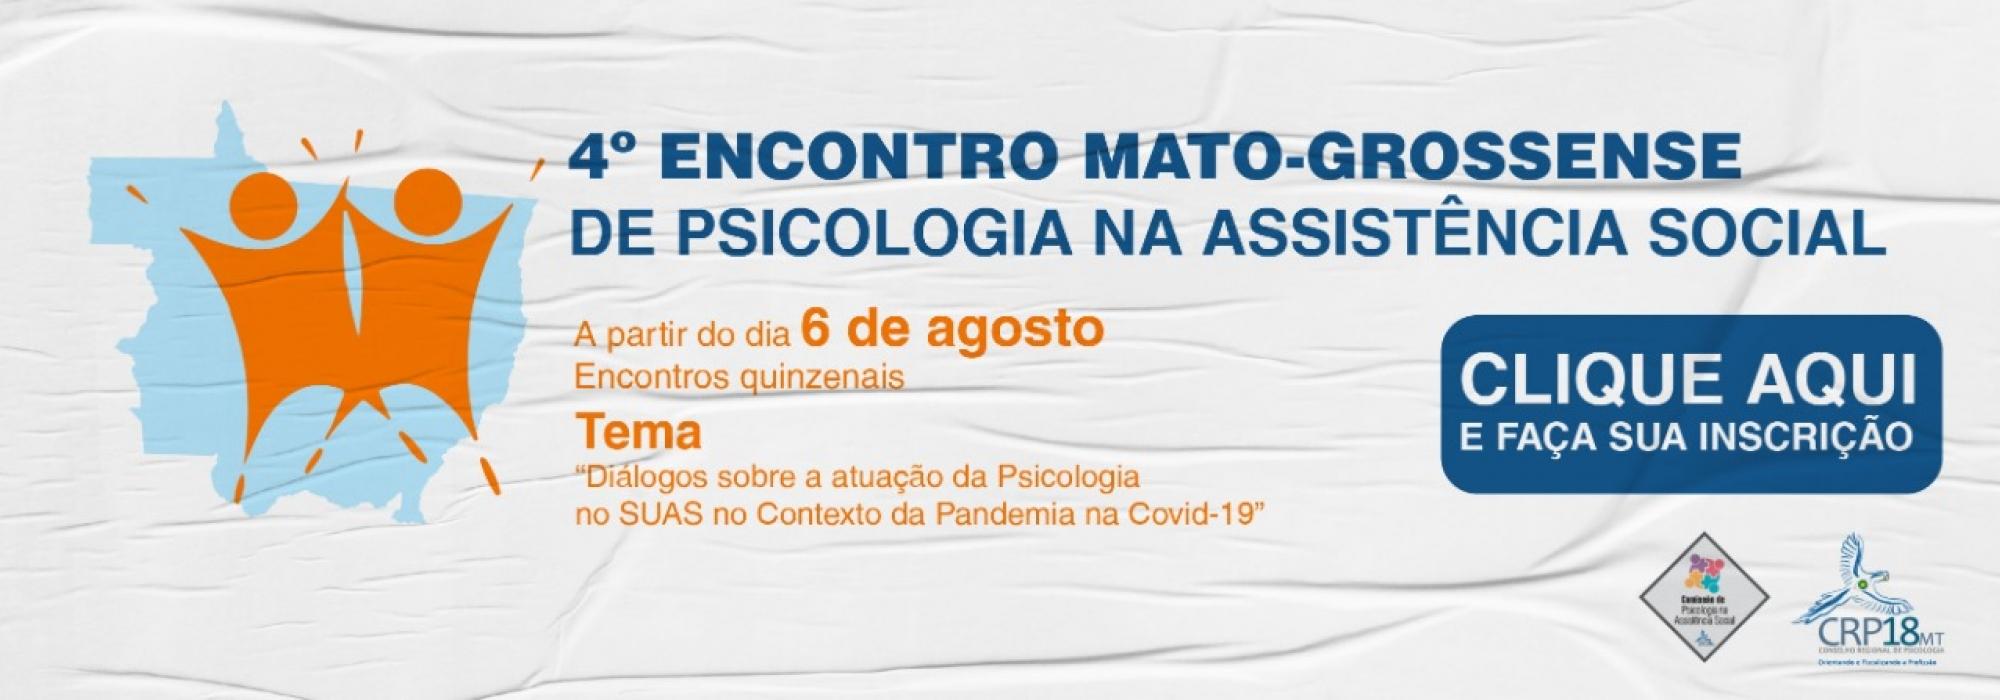 4º Encontro Mato-Grossense da Psicologia na Assistência Social